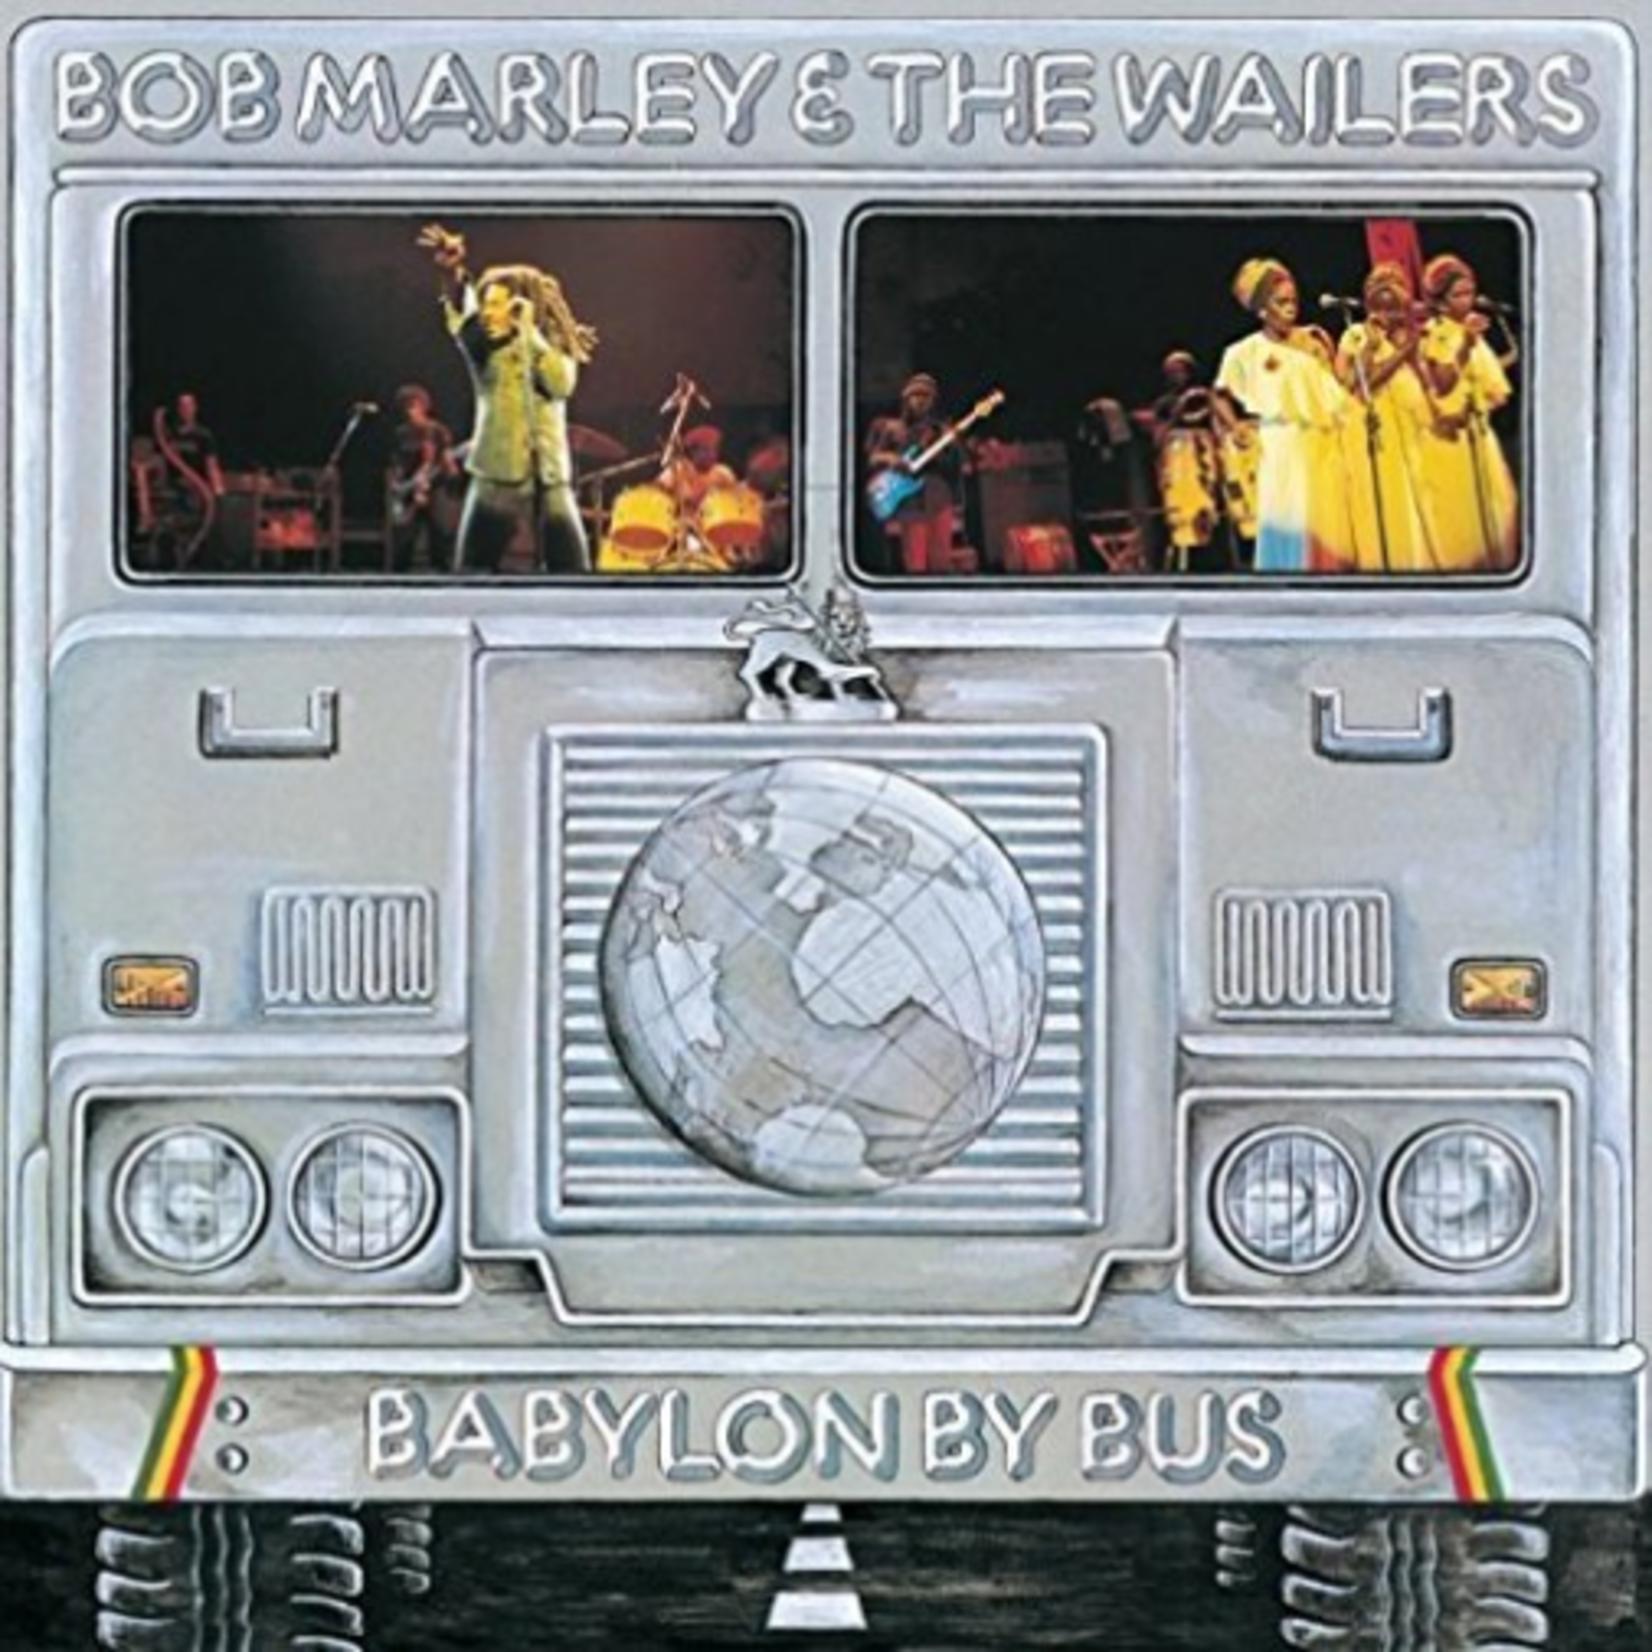 BOB MARLEY & THE WAILERS BABYLON BY BUS (2LP)